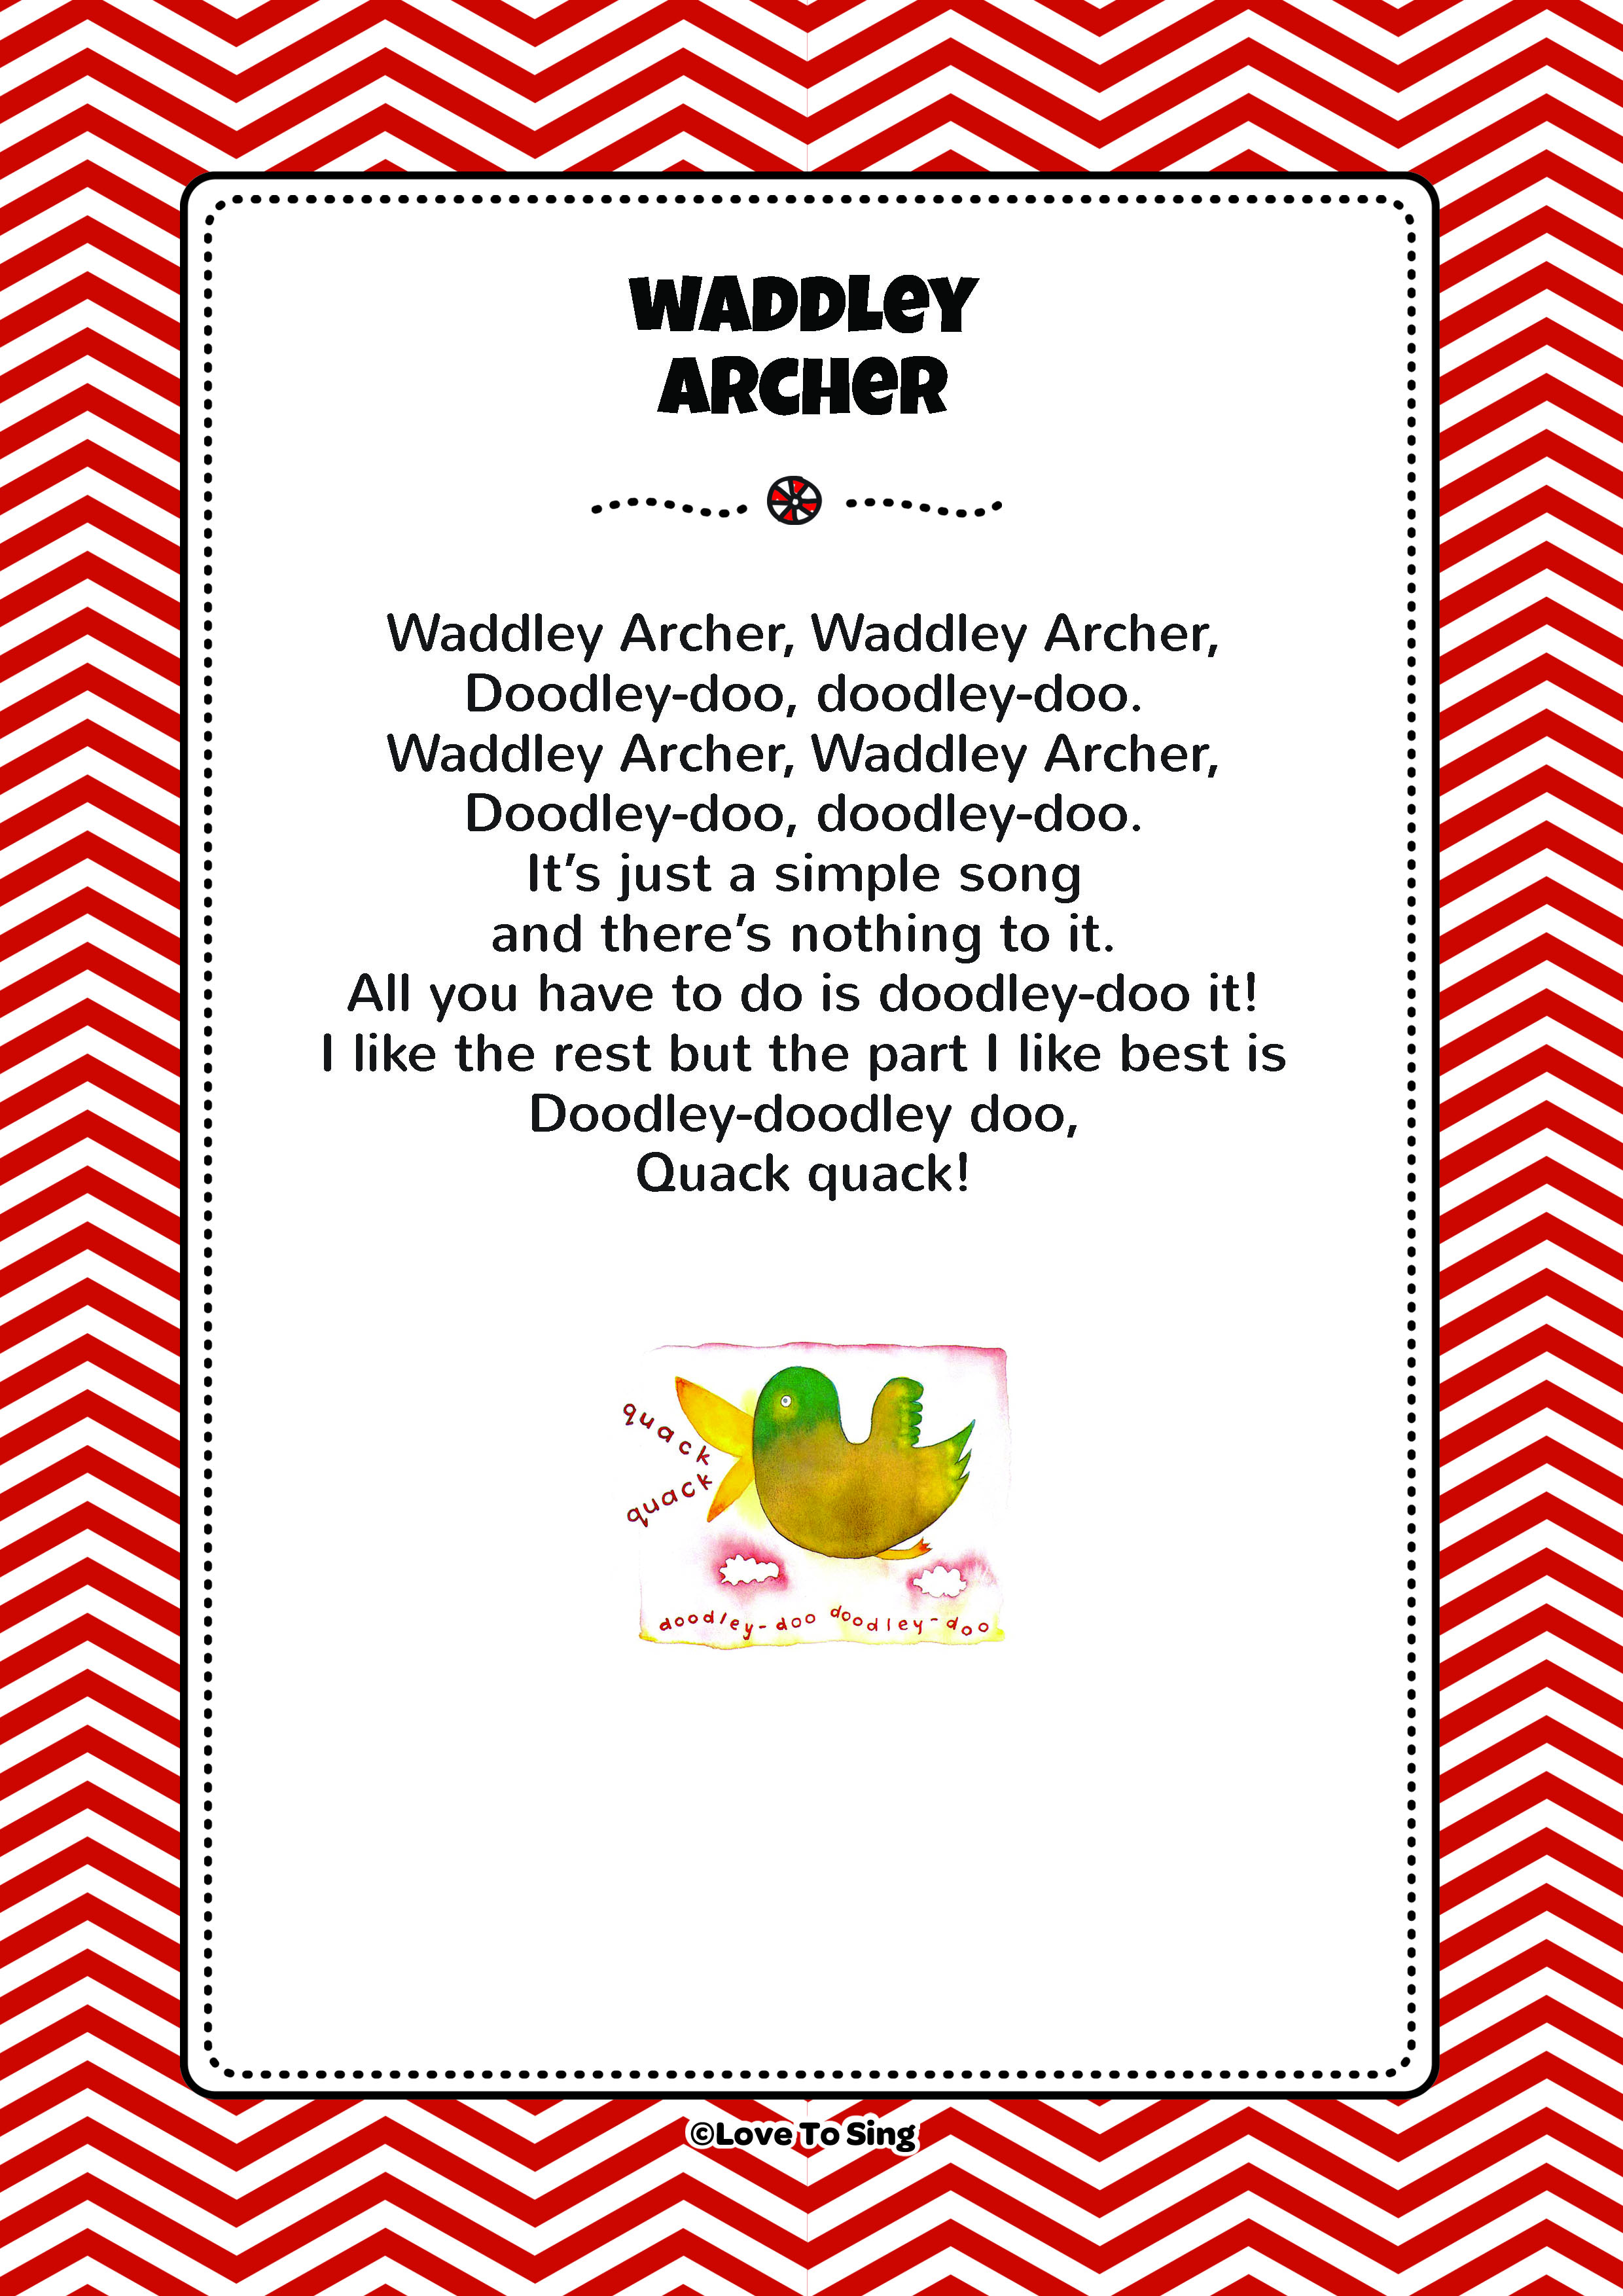 Waddley Archer Song | FREE Lyrics & Activities